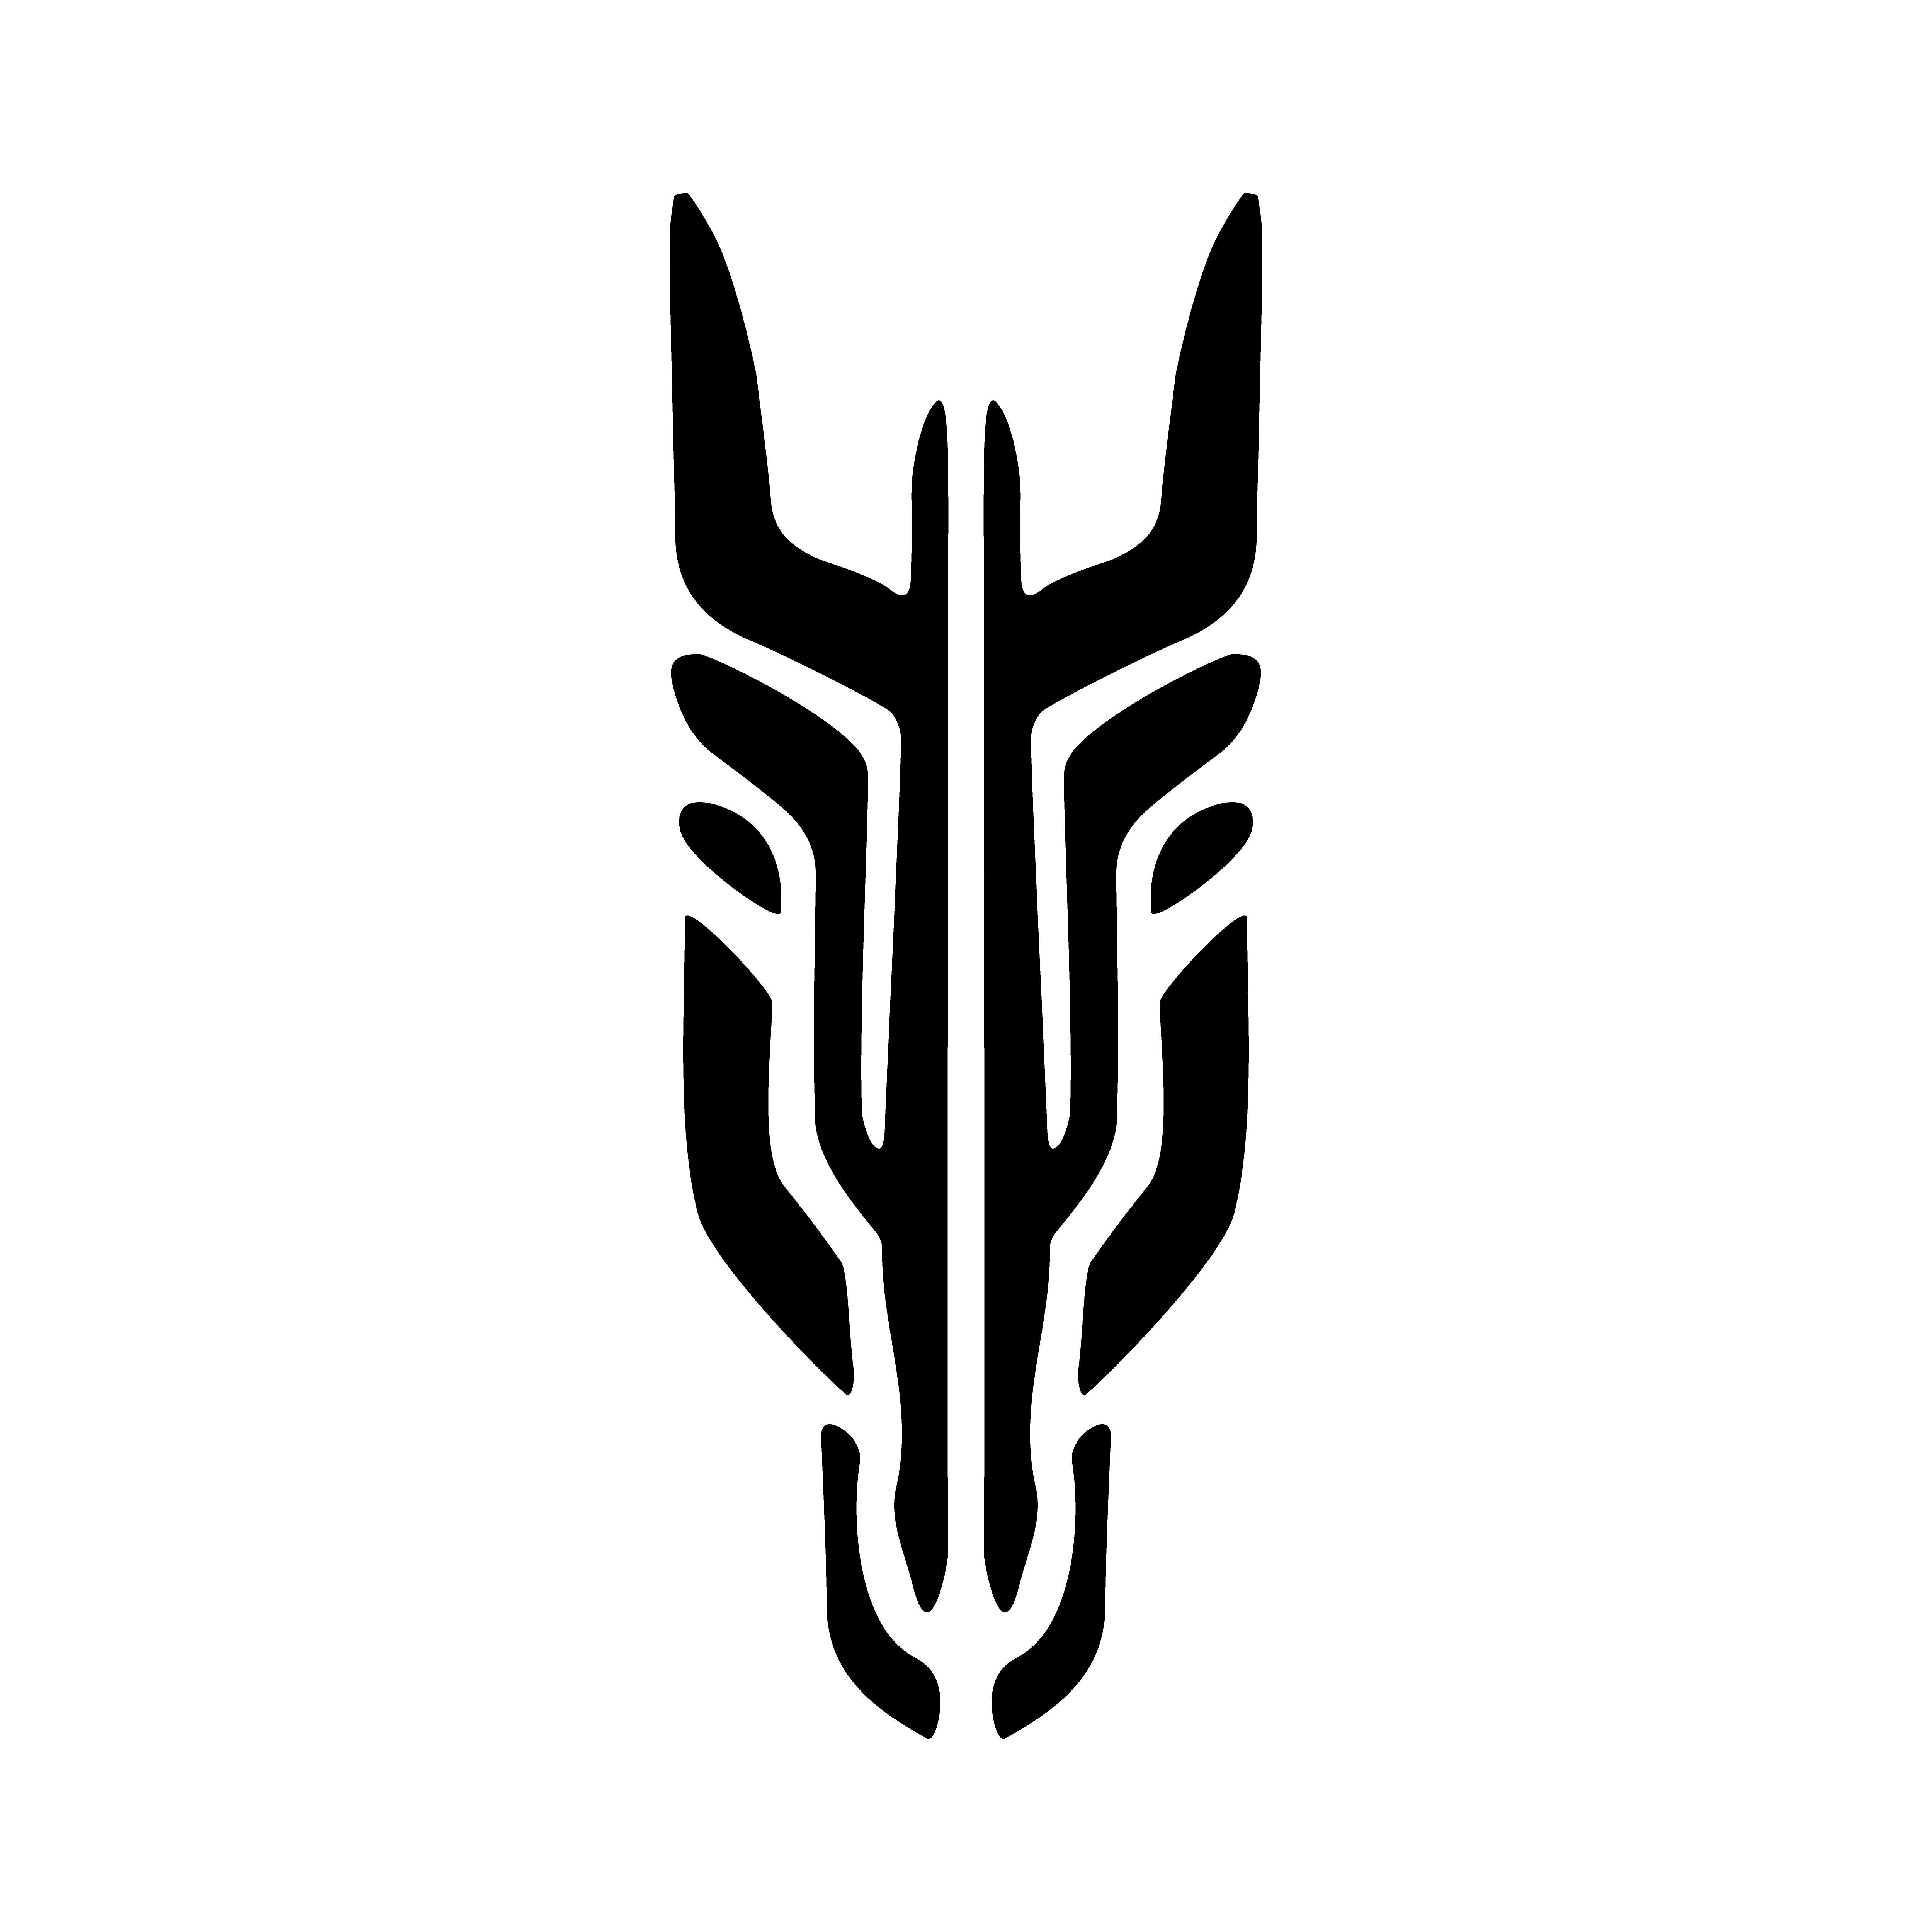 Zebra logo Logos design, Zebra design, Zebra